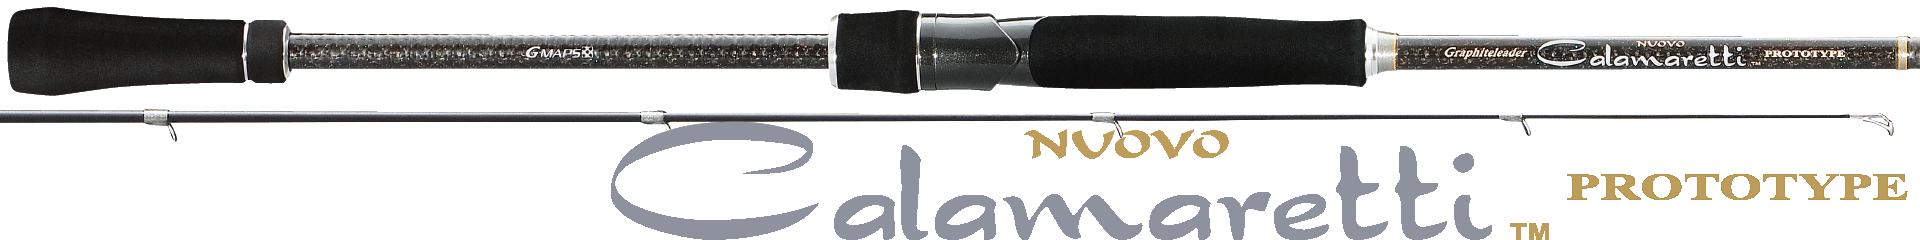 18 Calamaretti Prototype Nuovo